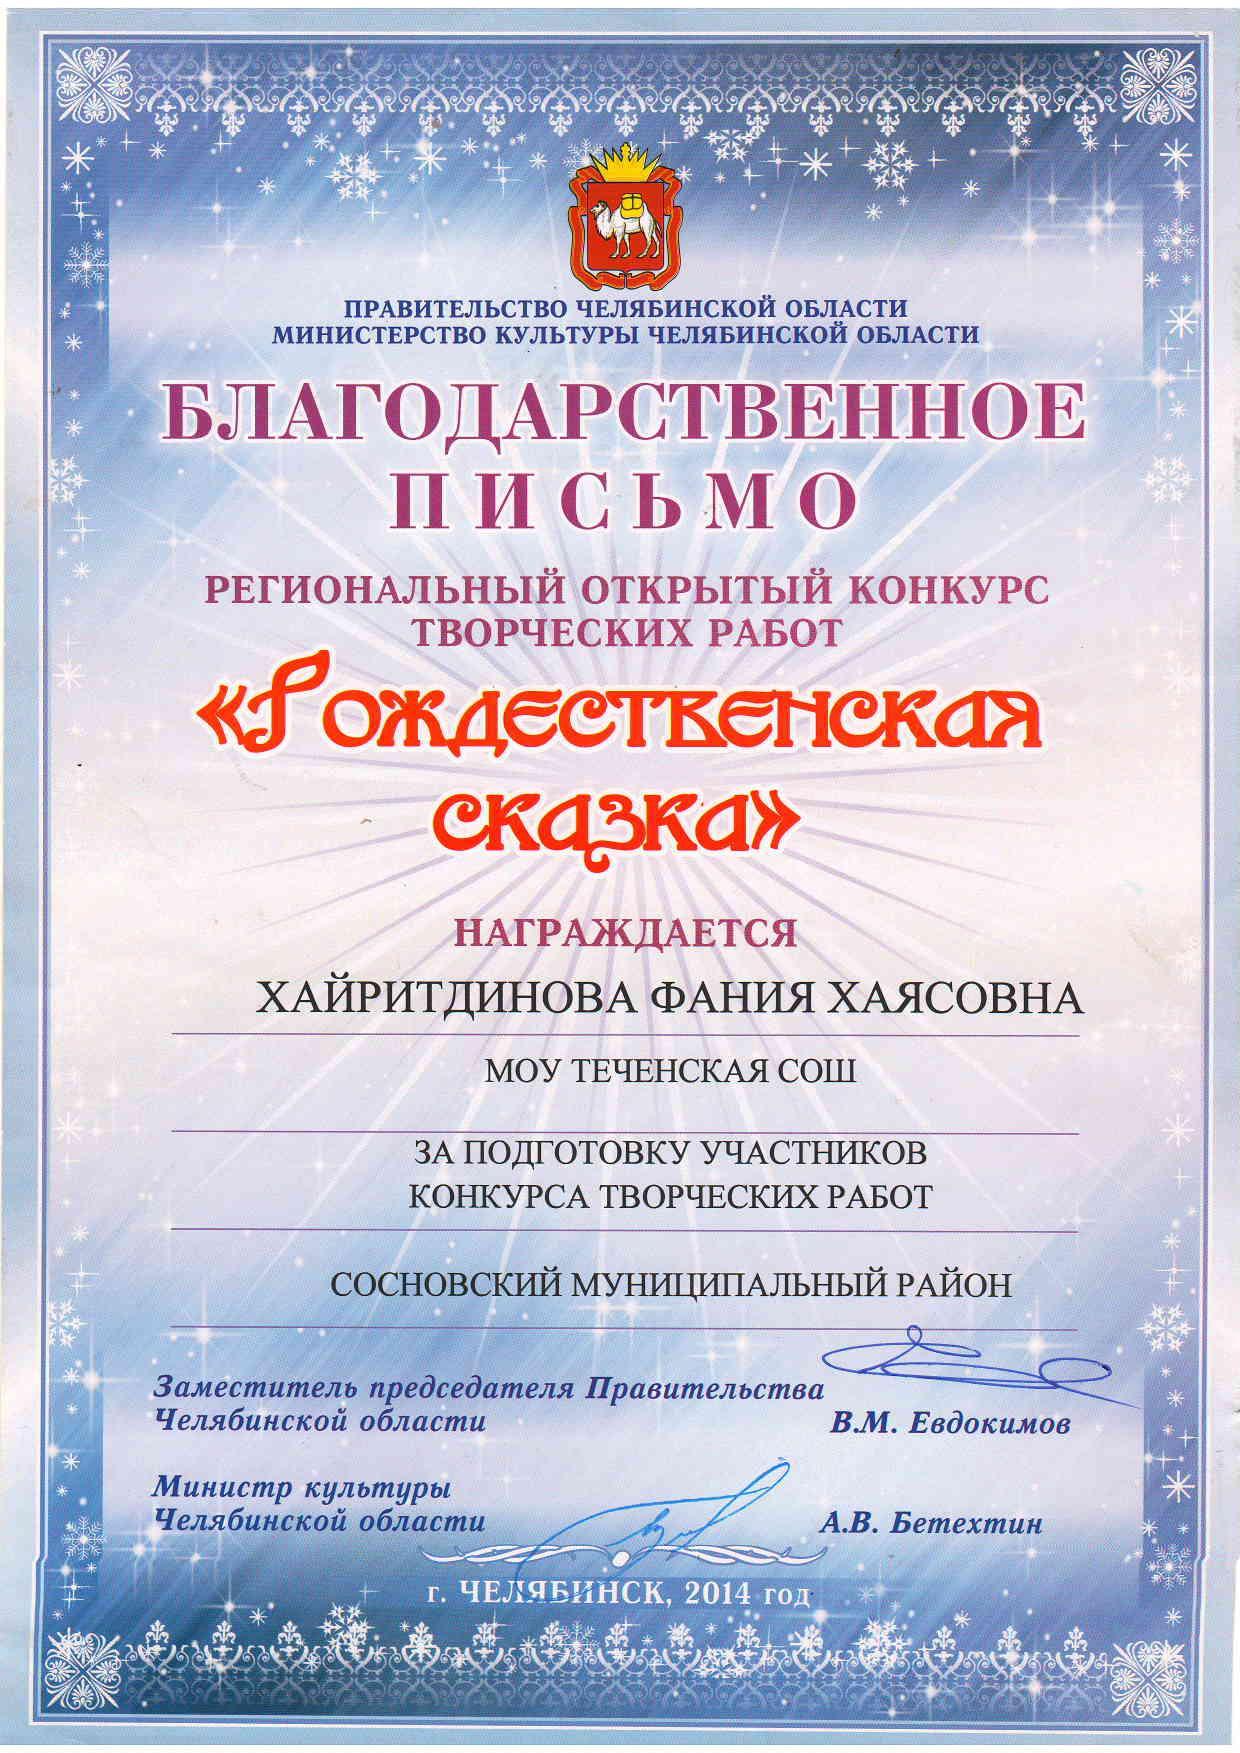 Новости Зоопарк Лимпопо г. Нижний Новгород